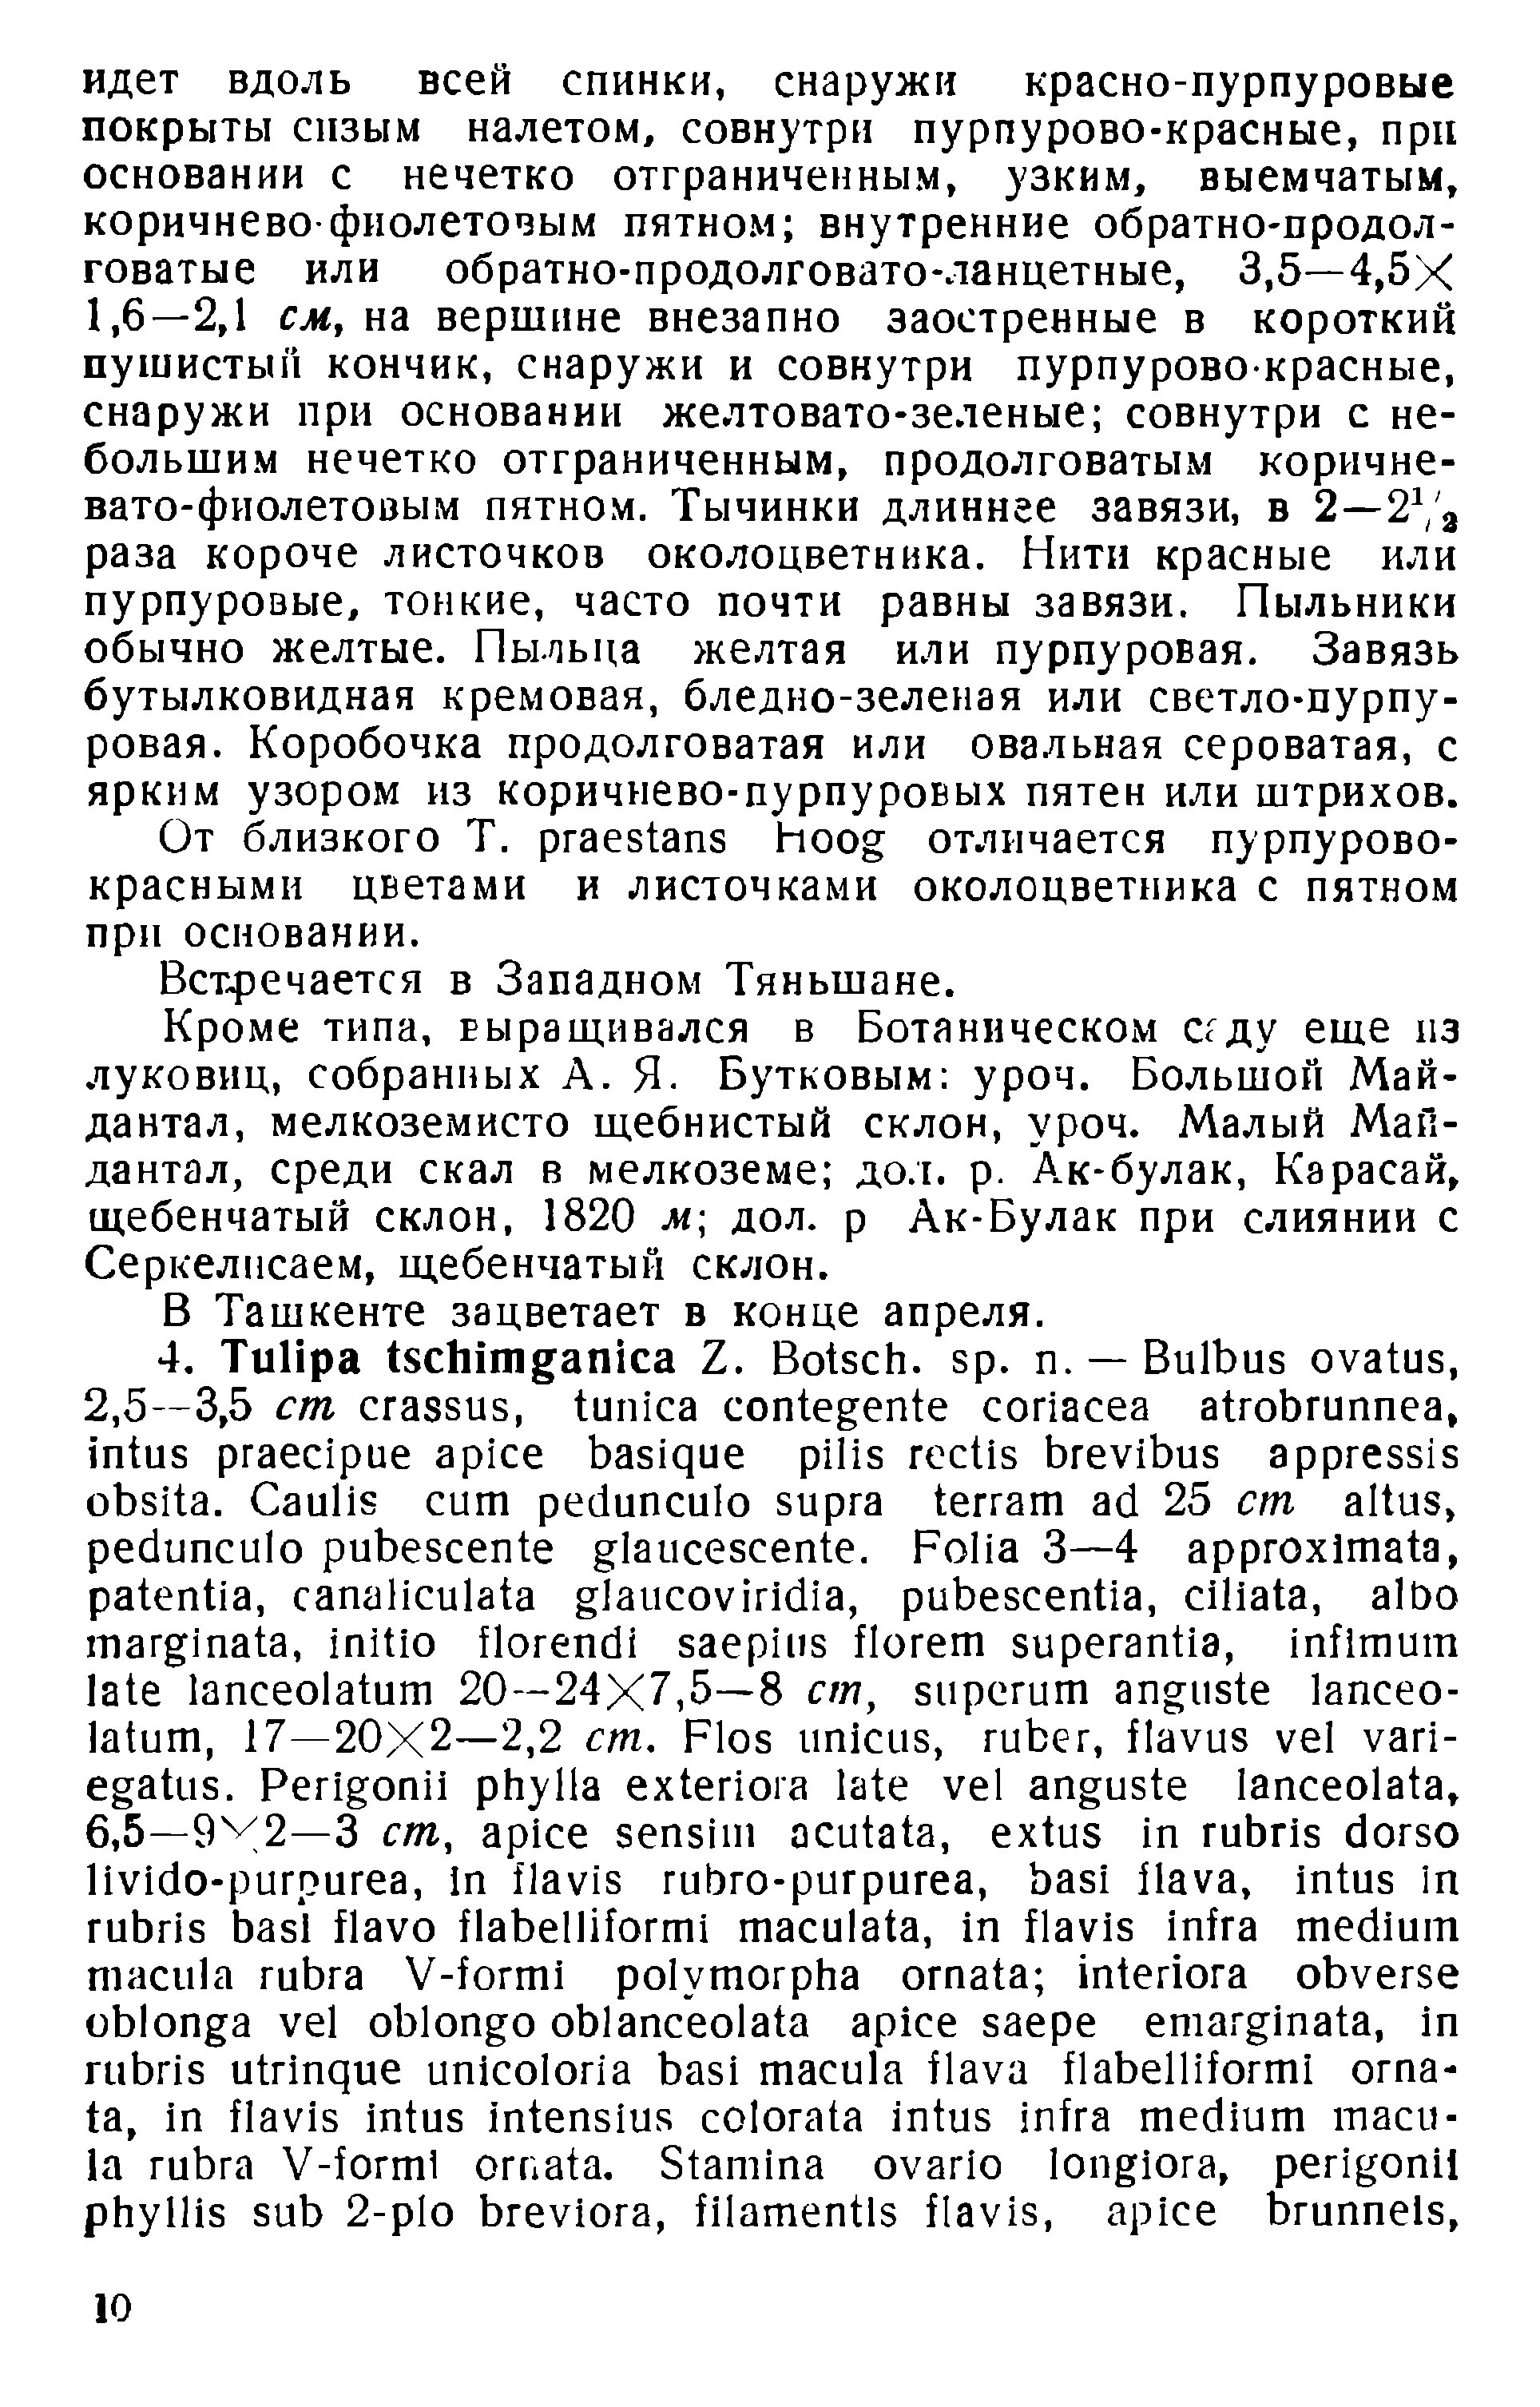 https://forum.plantarium.ru/misc.php?action=pun_attachment&item=28191&download=0